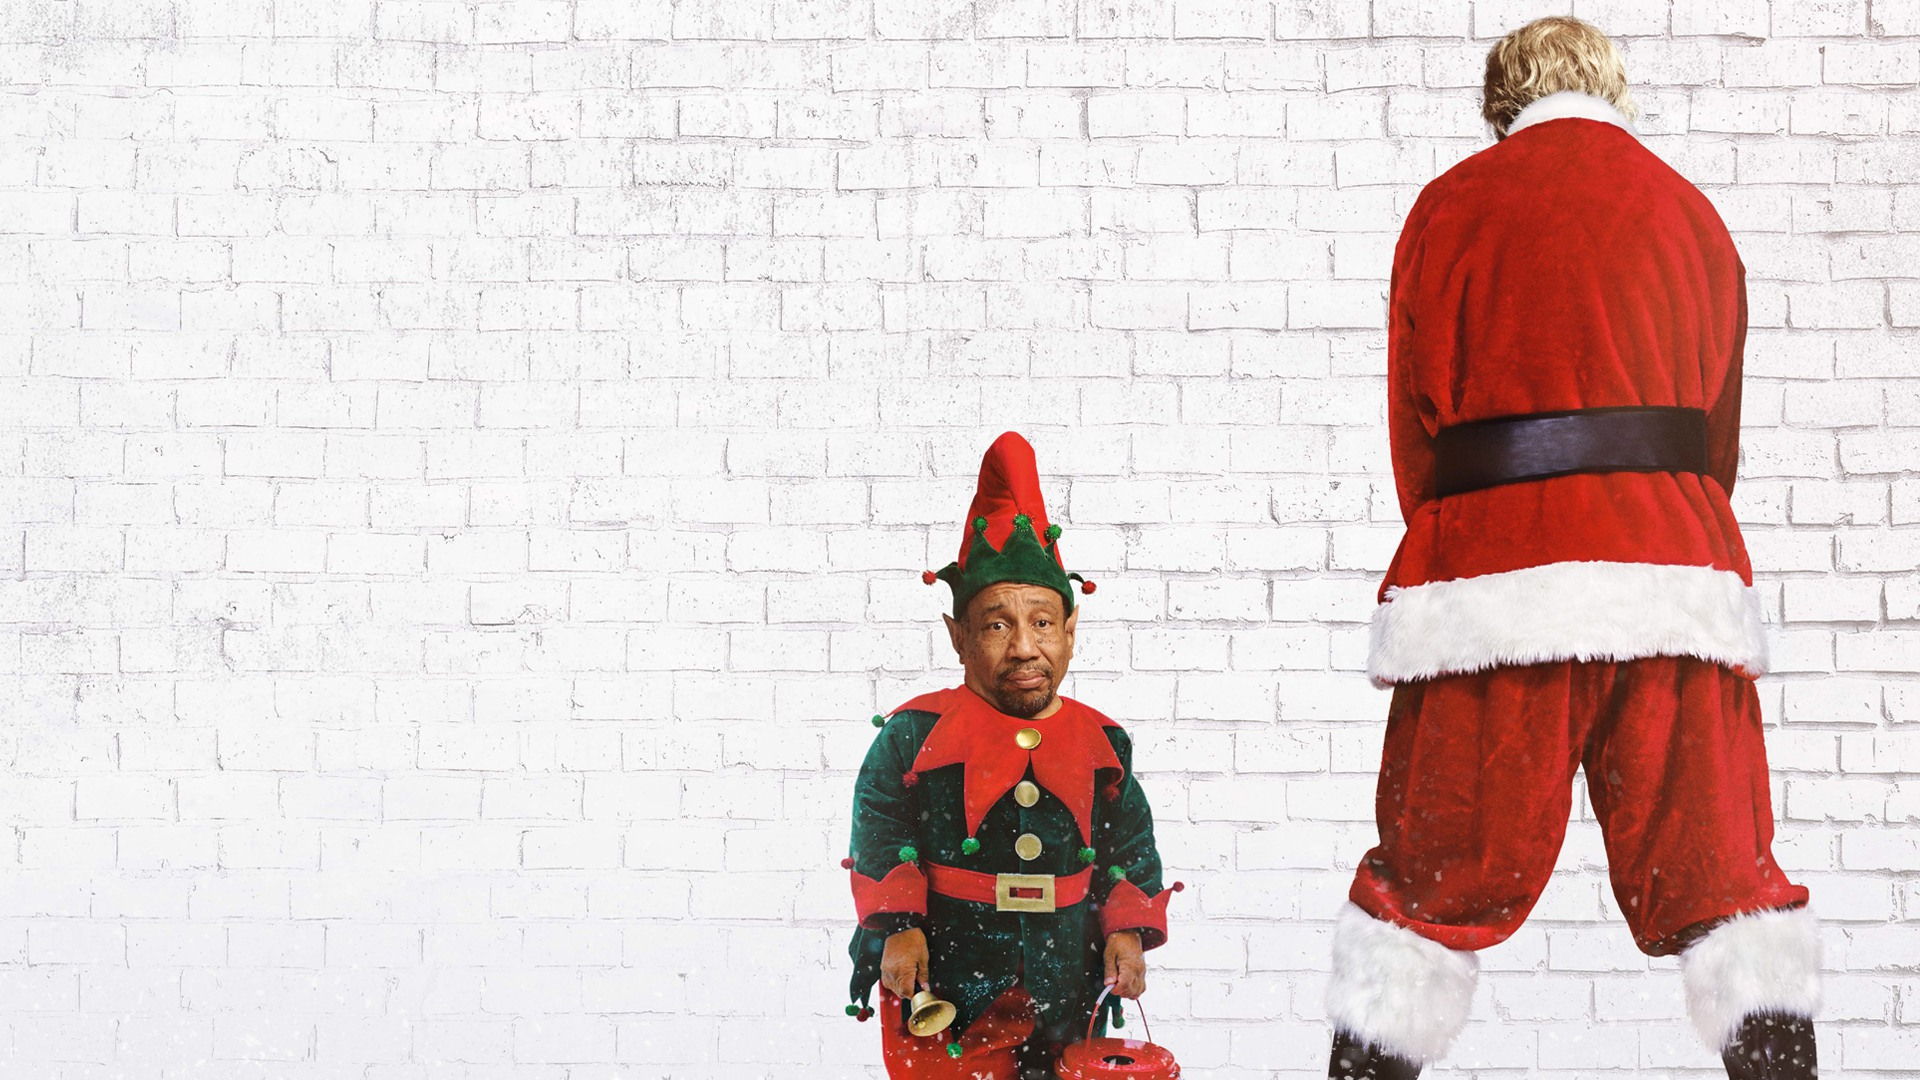 Bad Santa 2 Wallpapers Movie Hq Bad Santa 2 Pictures 4k Wallpapers 2019